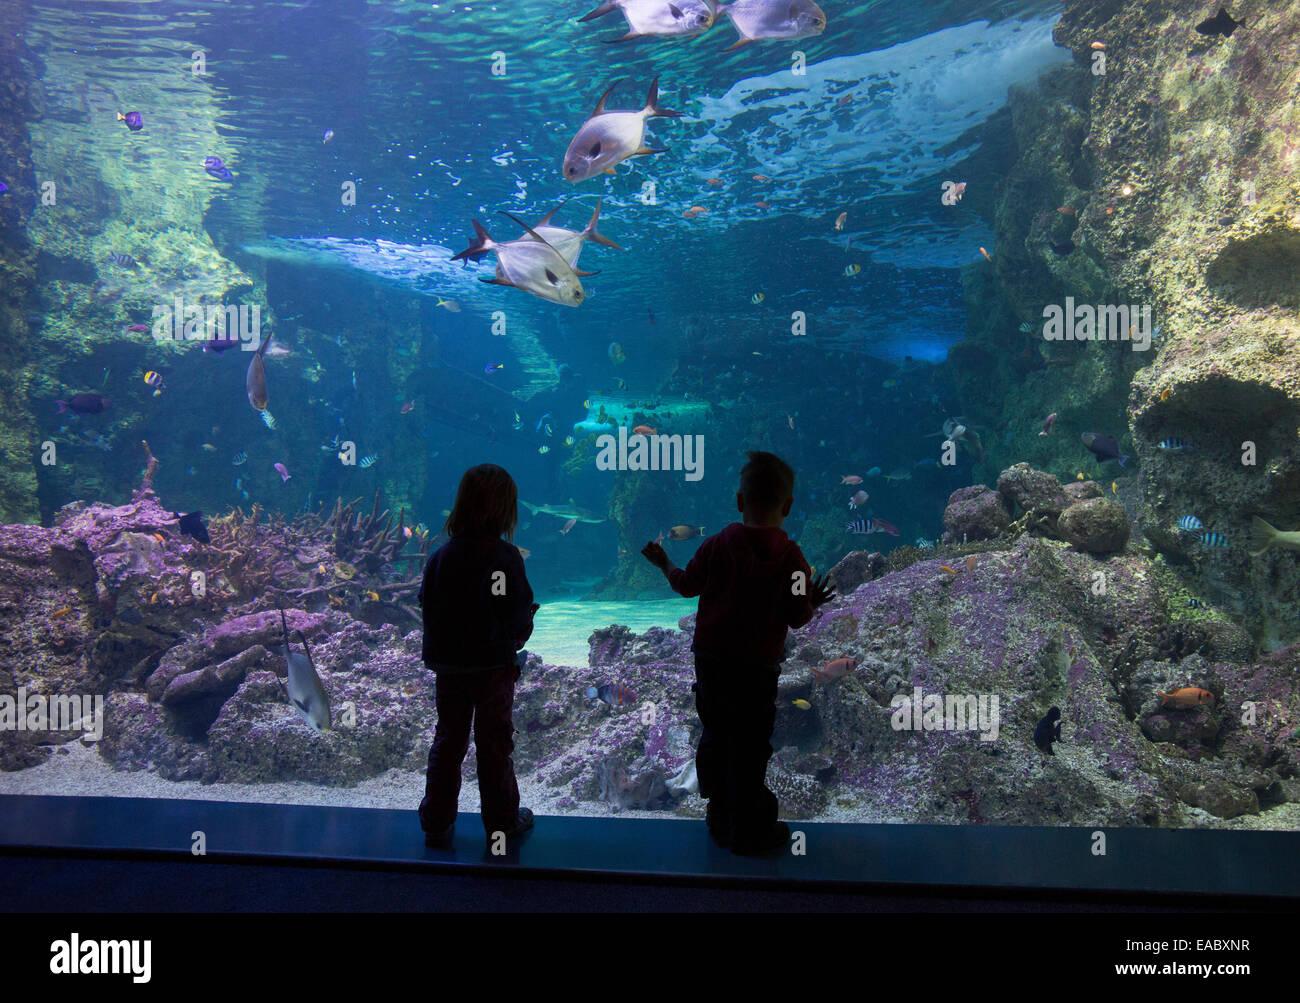 Silhouette of children looking at the Great Barrier Reef aquarium in the Sydney Sea Life Aquarium, Darling Harbour, - Stock Image